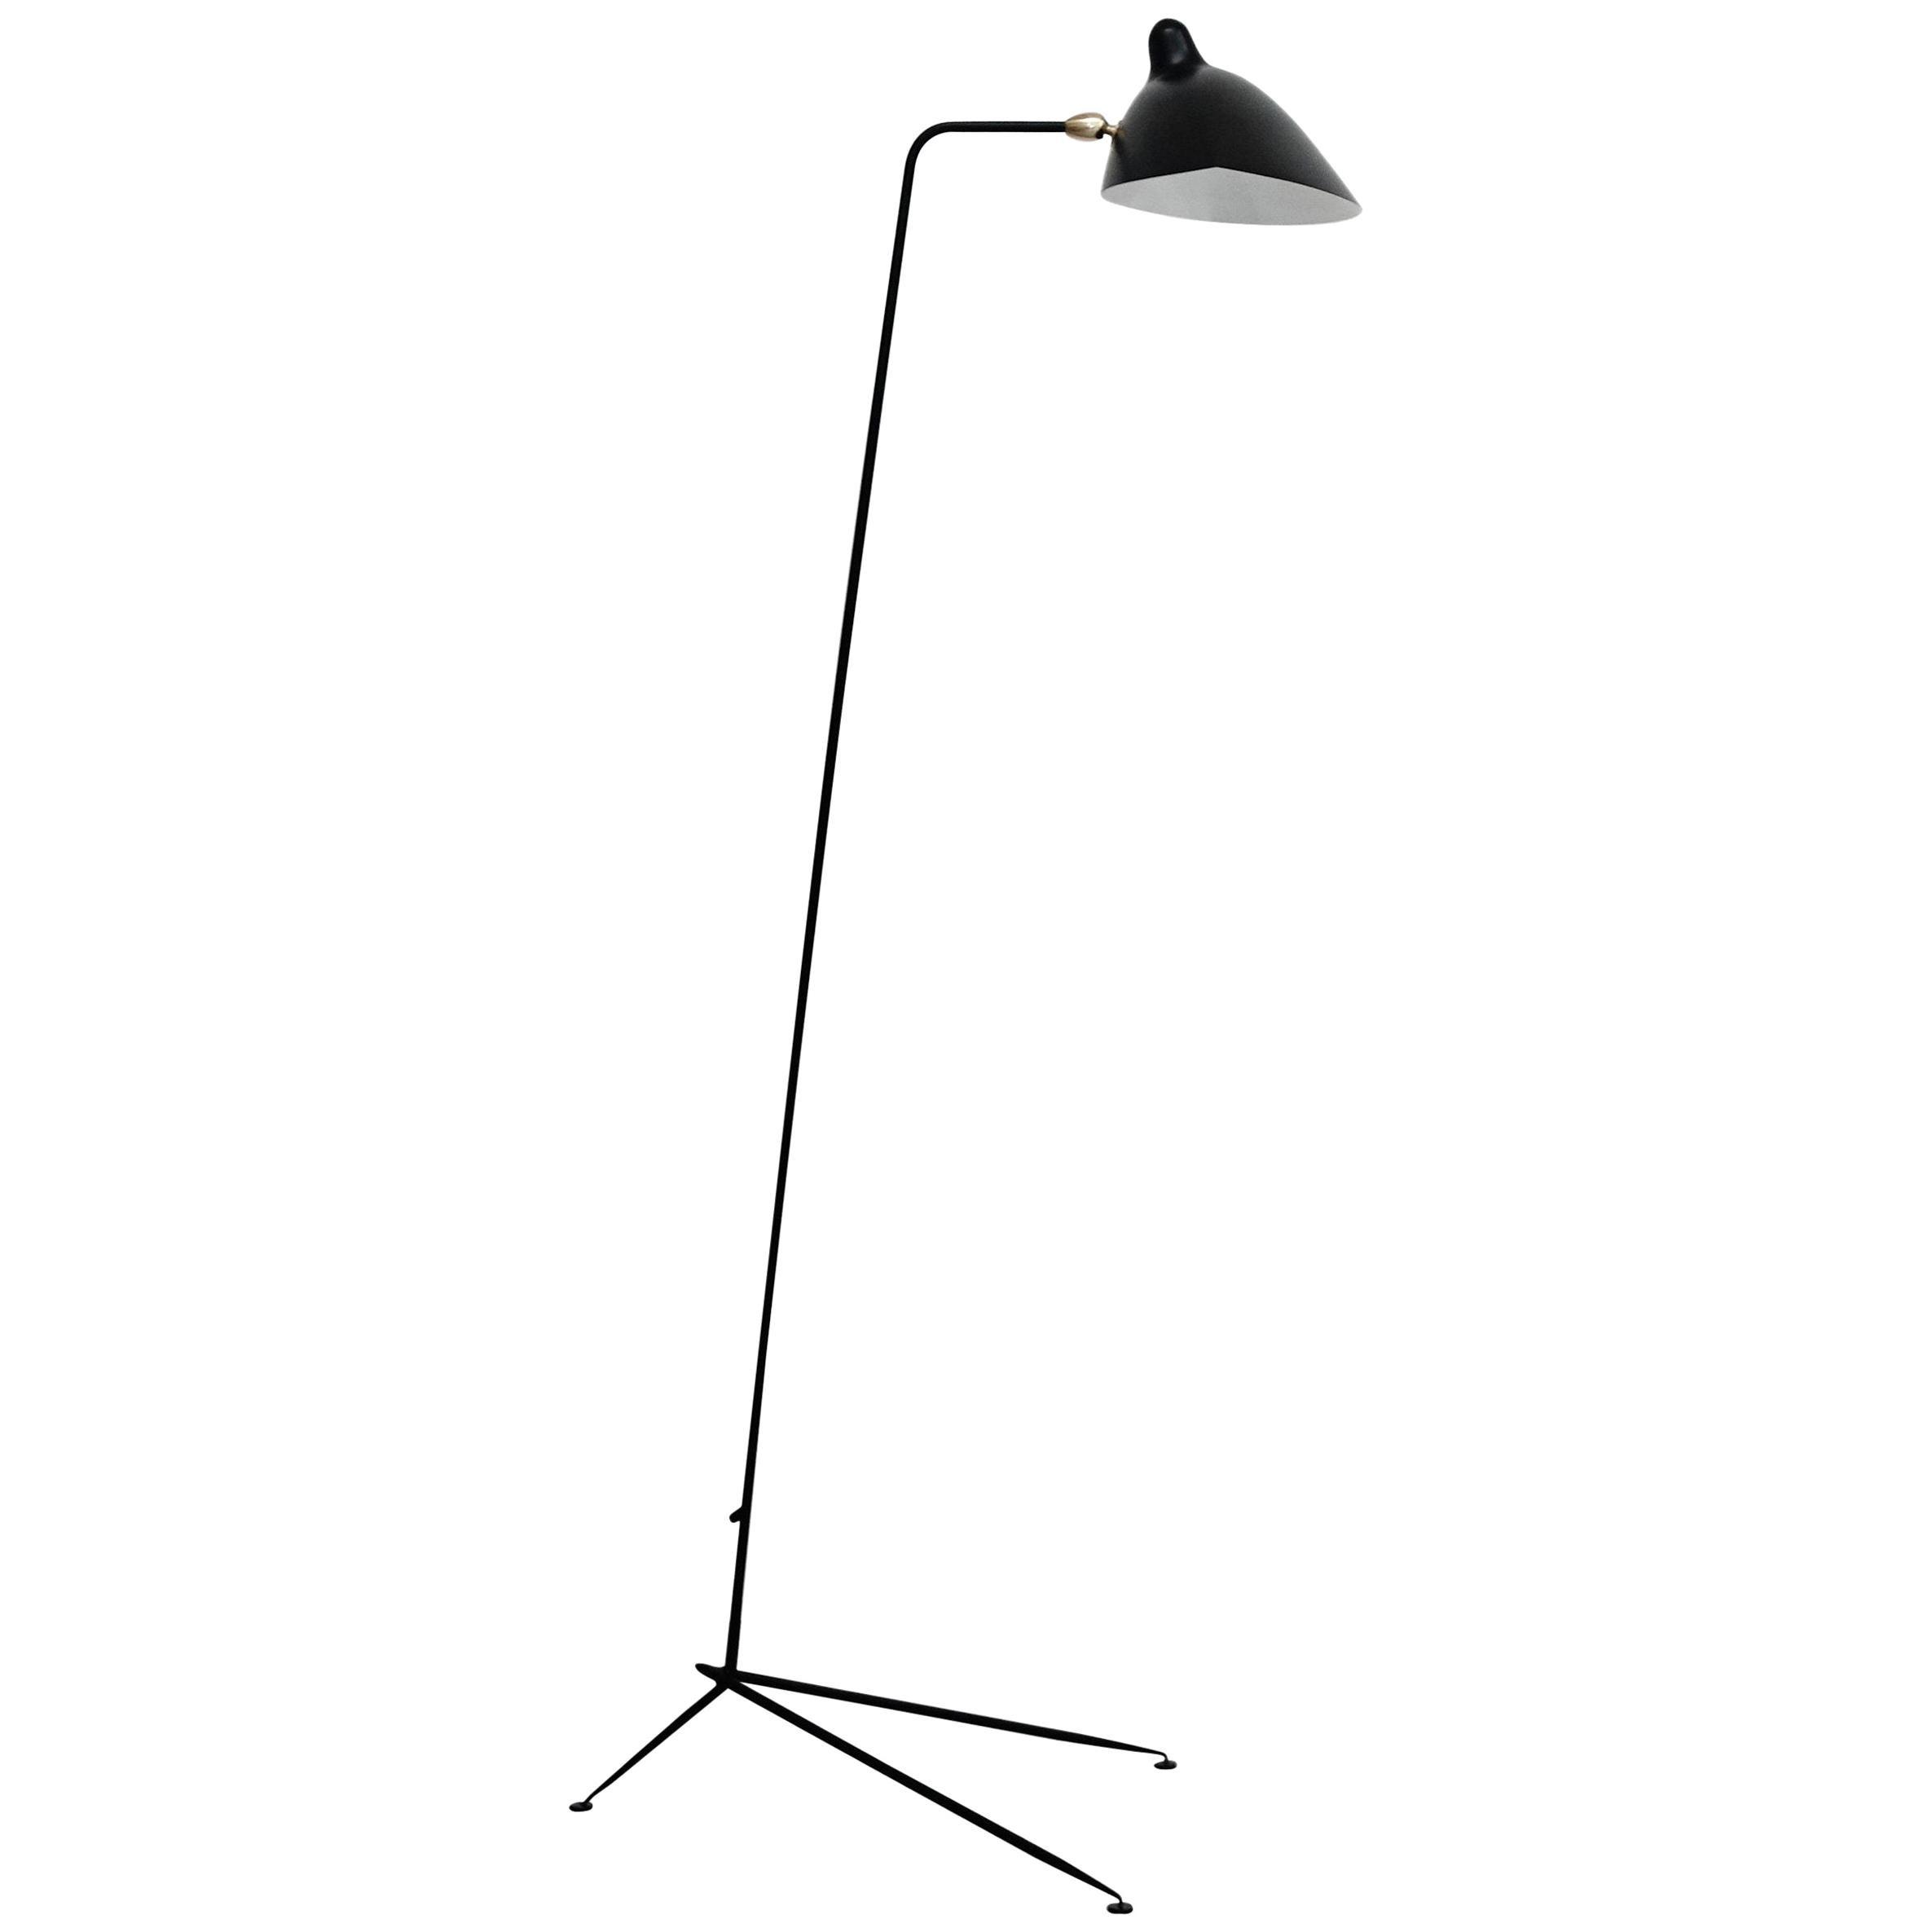 Serge Mouille Mid-Century Modern Black One-Arm Standing Lamp